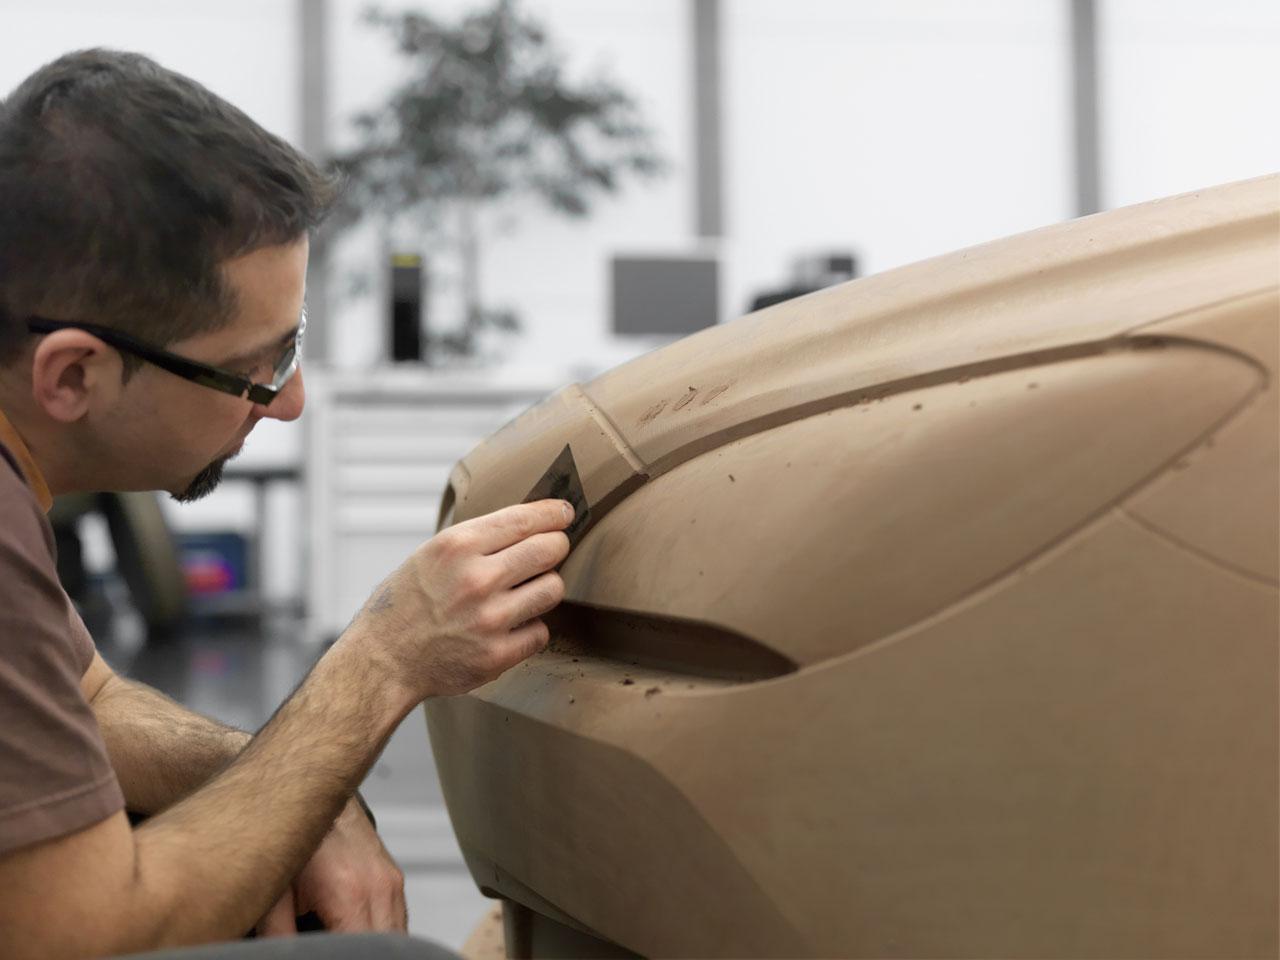 2010 BMW Concept Gran Coupe - Concepts